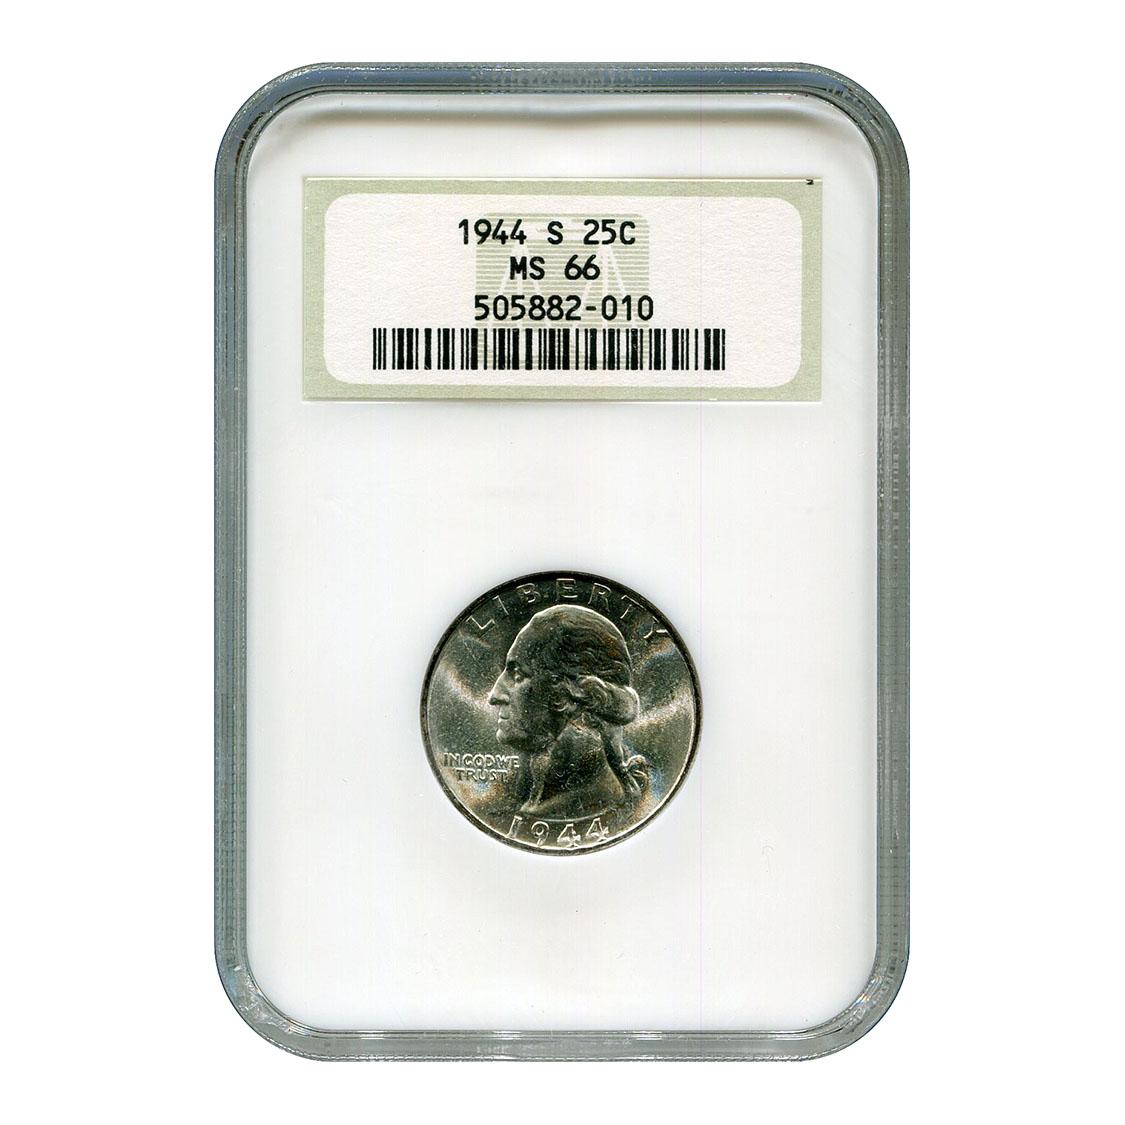 Certified Washington Quarter 1944-S MS66 NGC